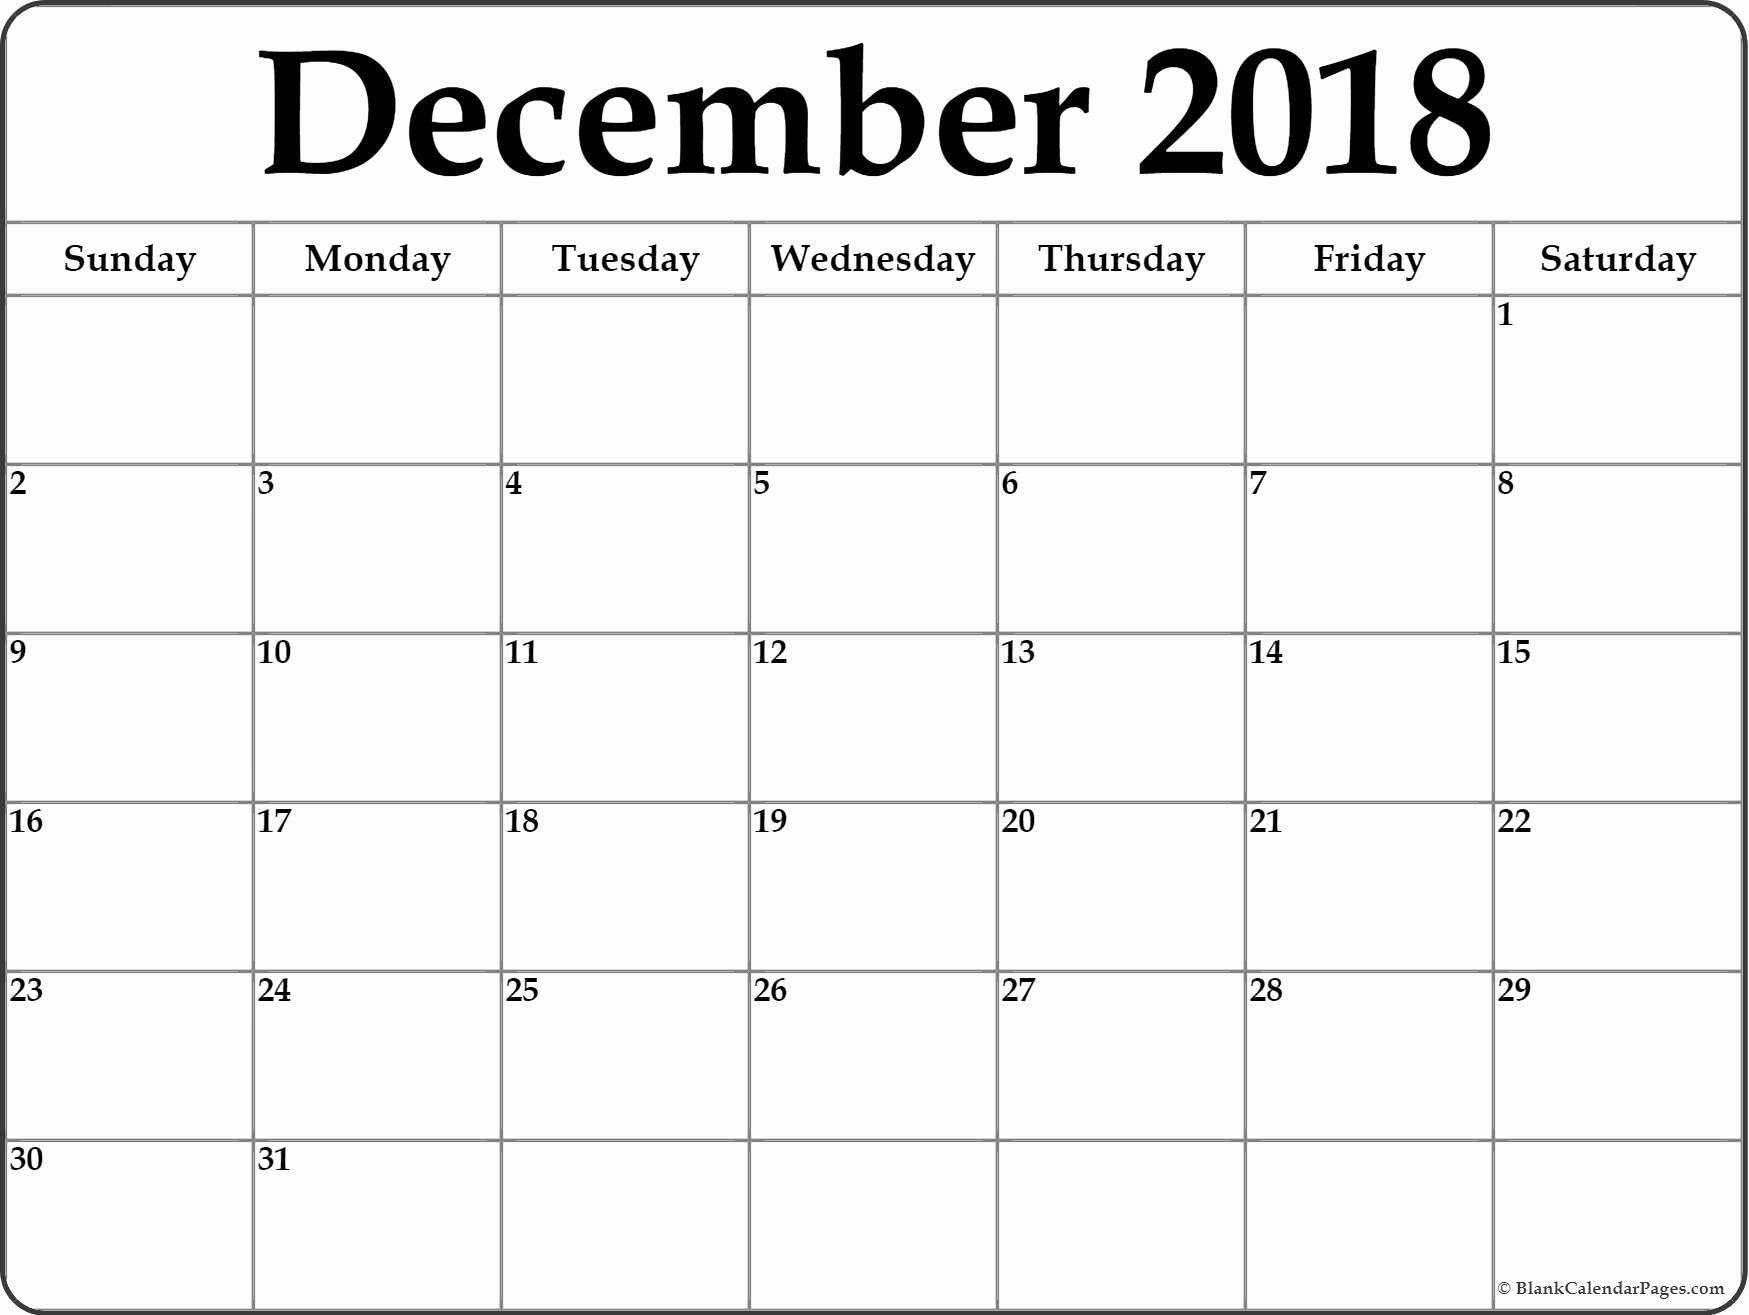 Calendar December 2018 And January 2019 | December 2018 Calendar in Blank Printable December Calandar